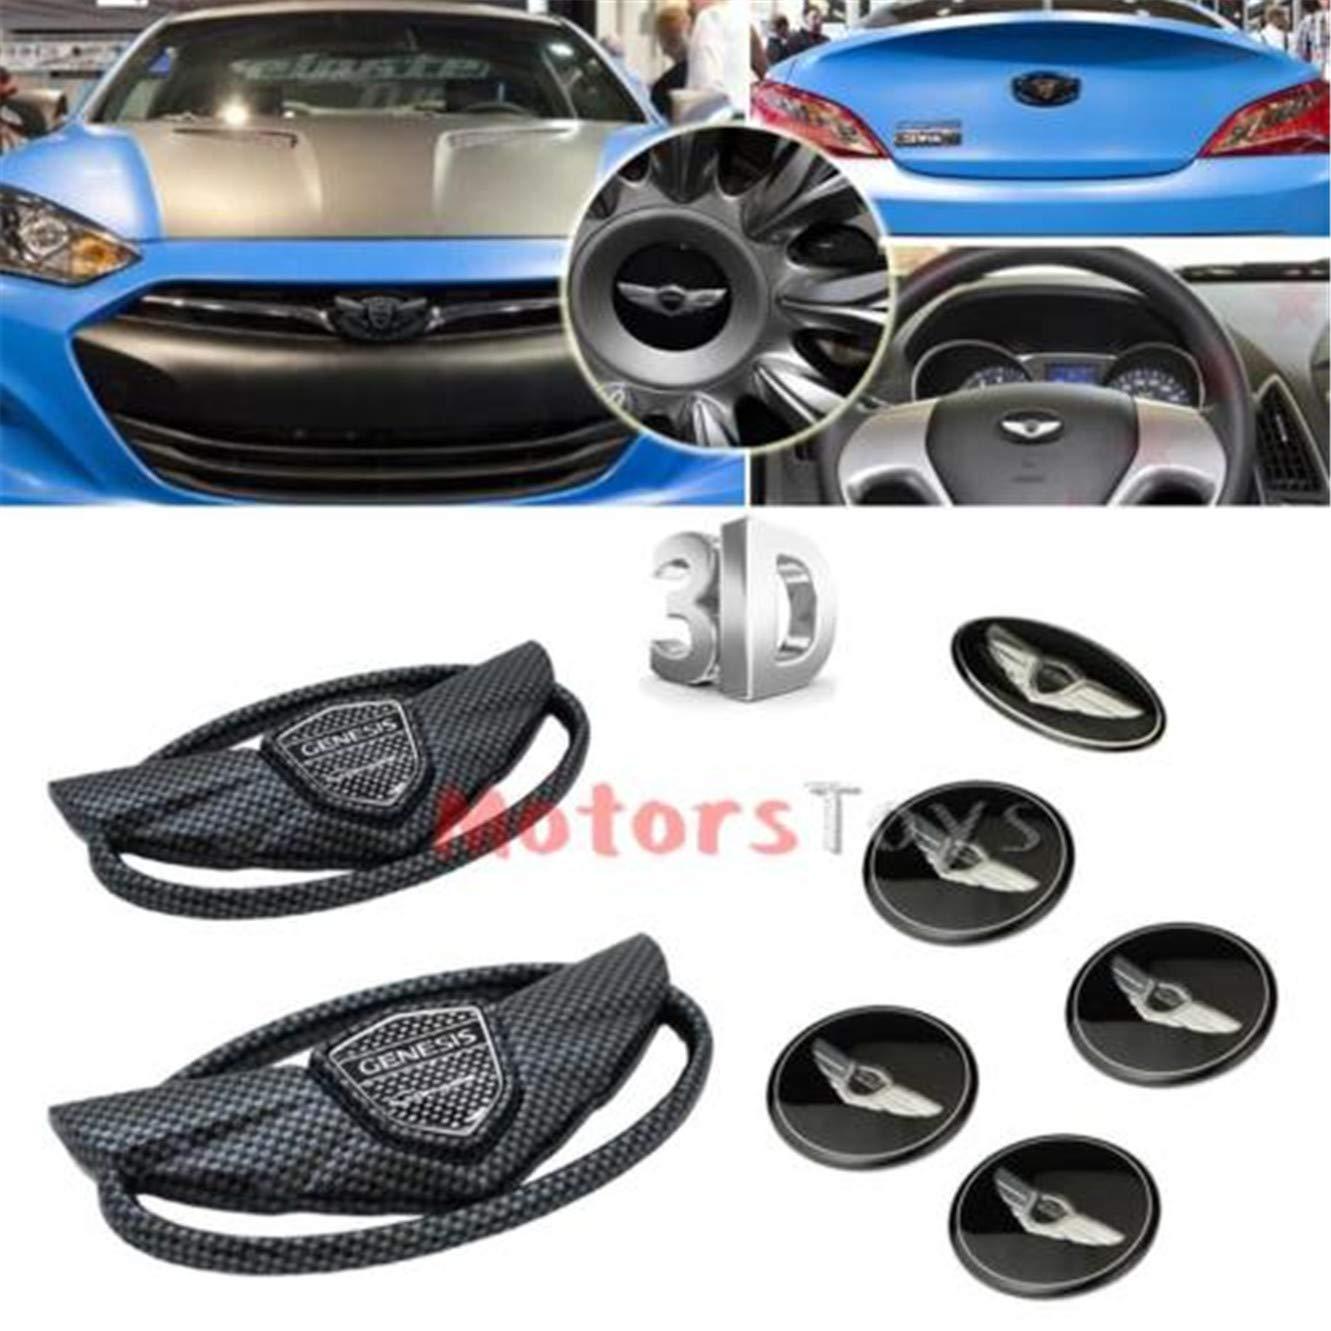 Luck16888 7pcs Emblem Badge Grille Trunk Steering Wheel Rim Cover ...